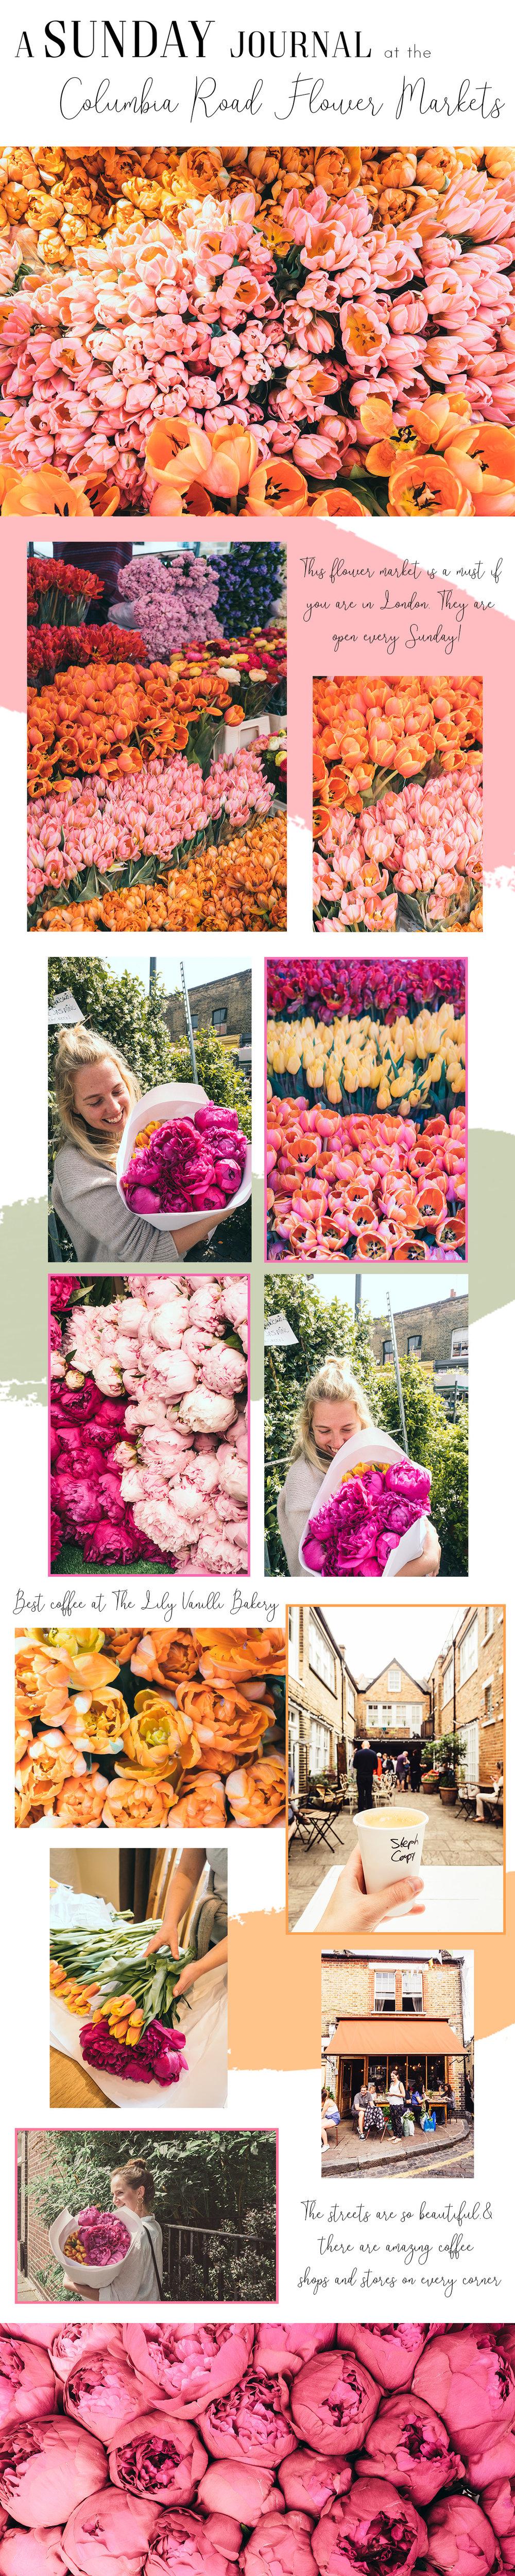 Columbia Flower Markets.jpg